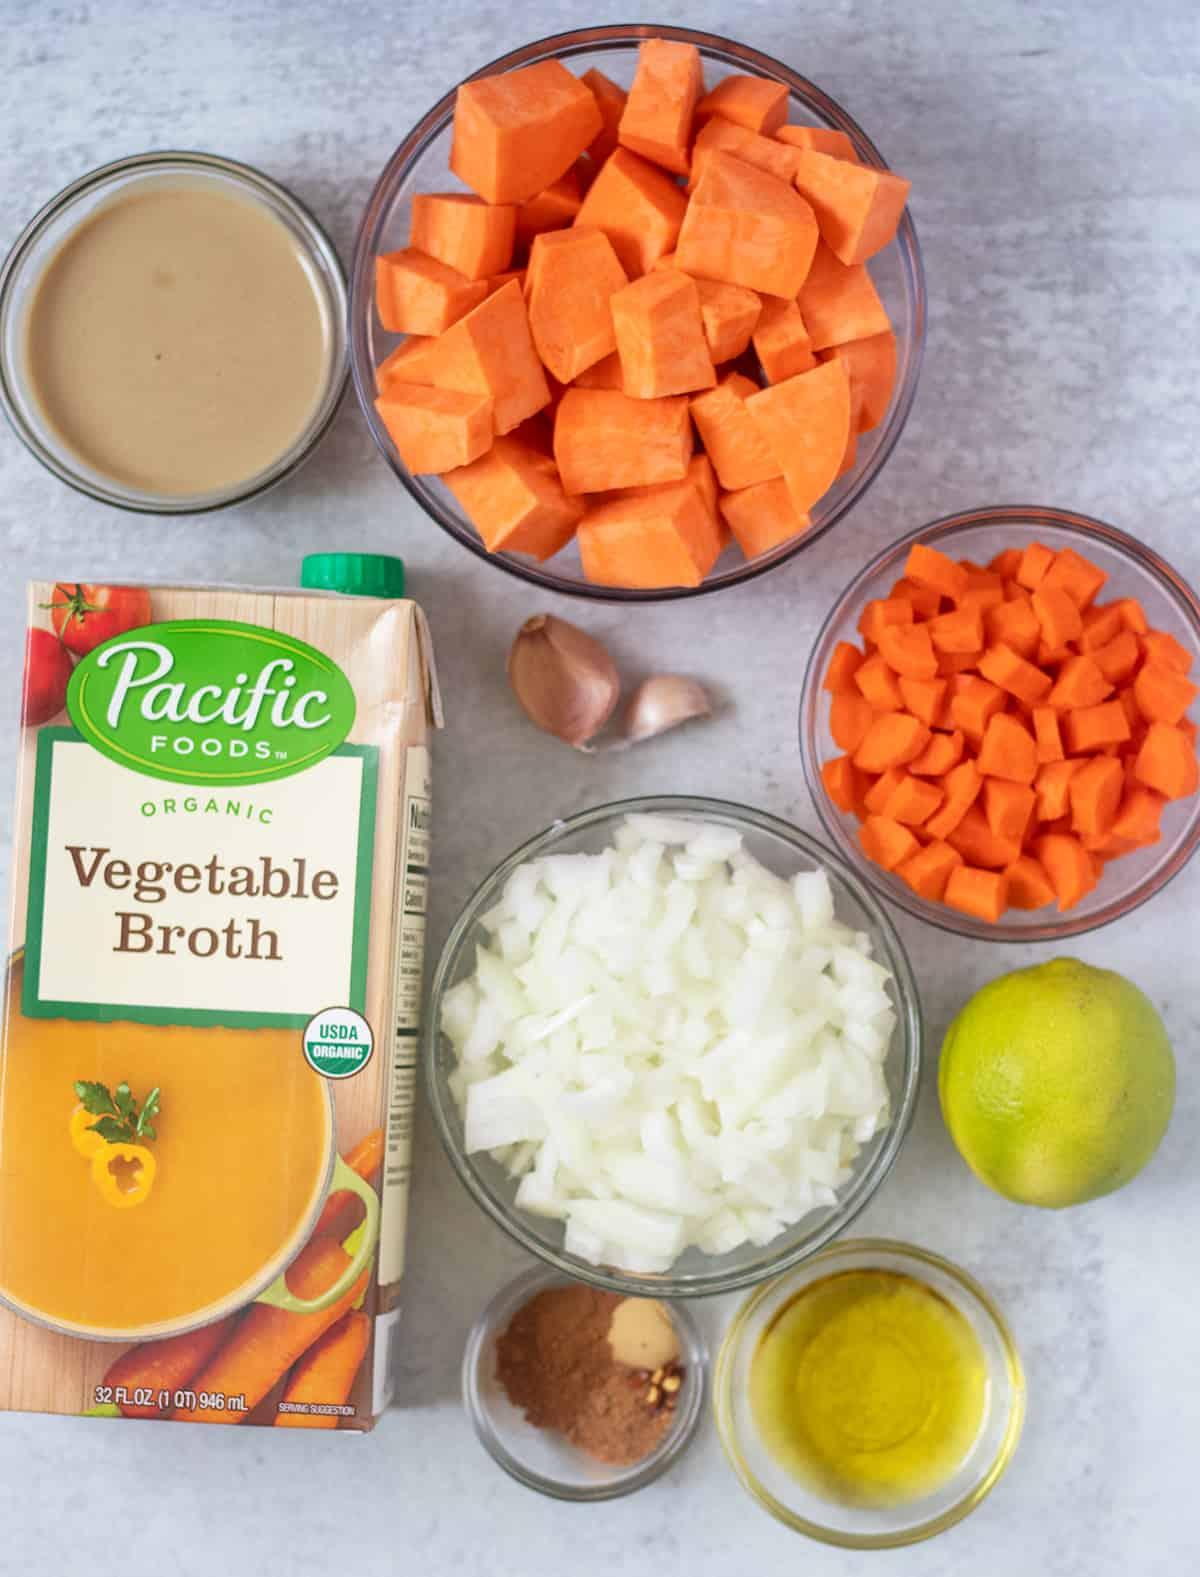 sweet potatoes, tahini, vegetable broth, garlic, carrots, onion, lime, olive oil, seasonings